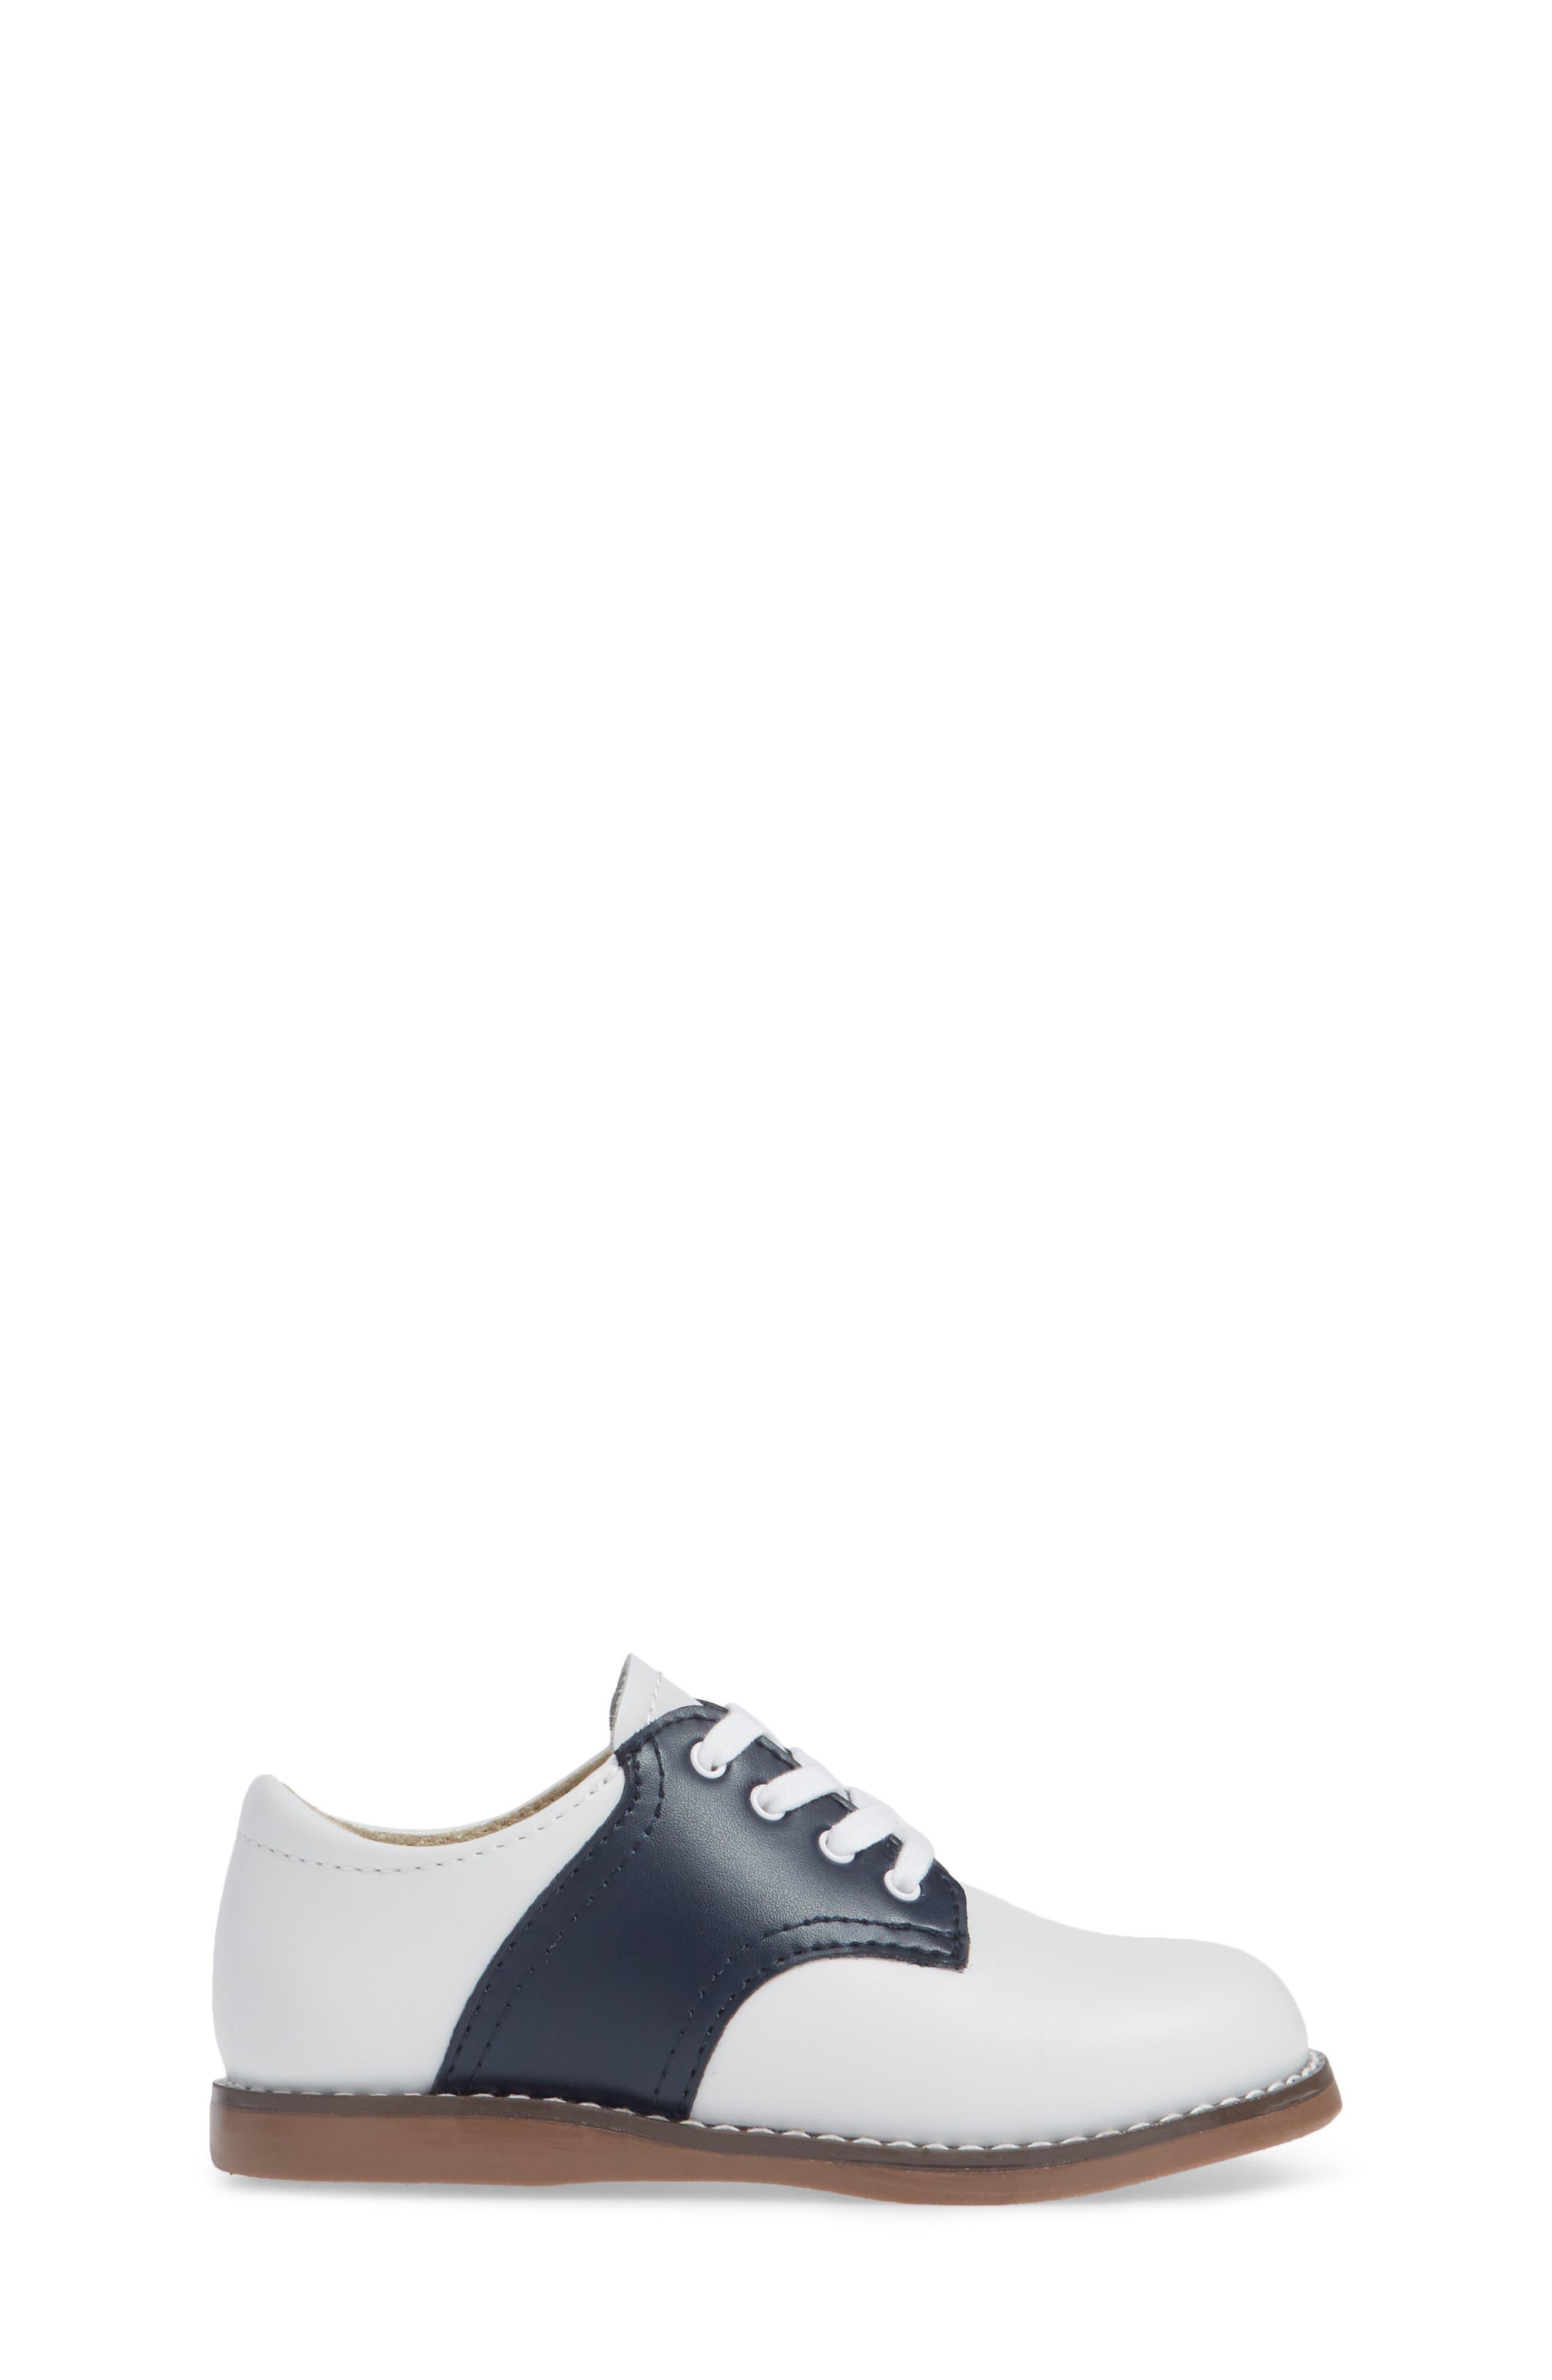 FOOTMATES, Cheer Oxford, Alternate thumbnail 3, color, WHITE/ NAVY